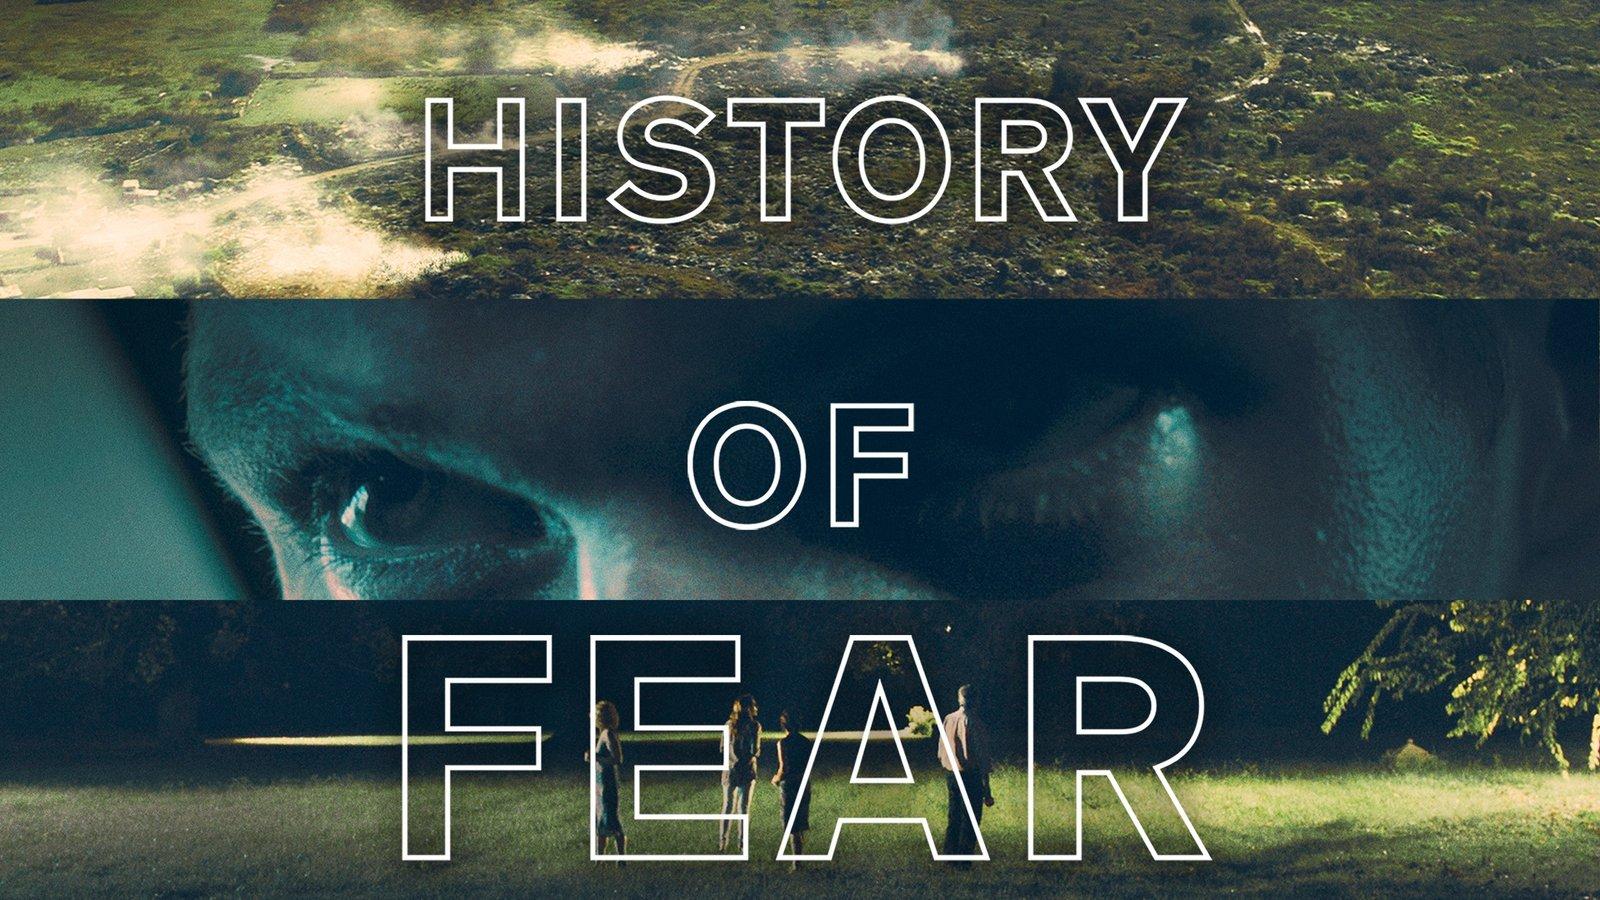 History of Fear - Historia del miedo